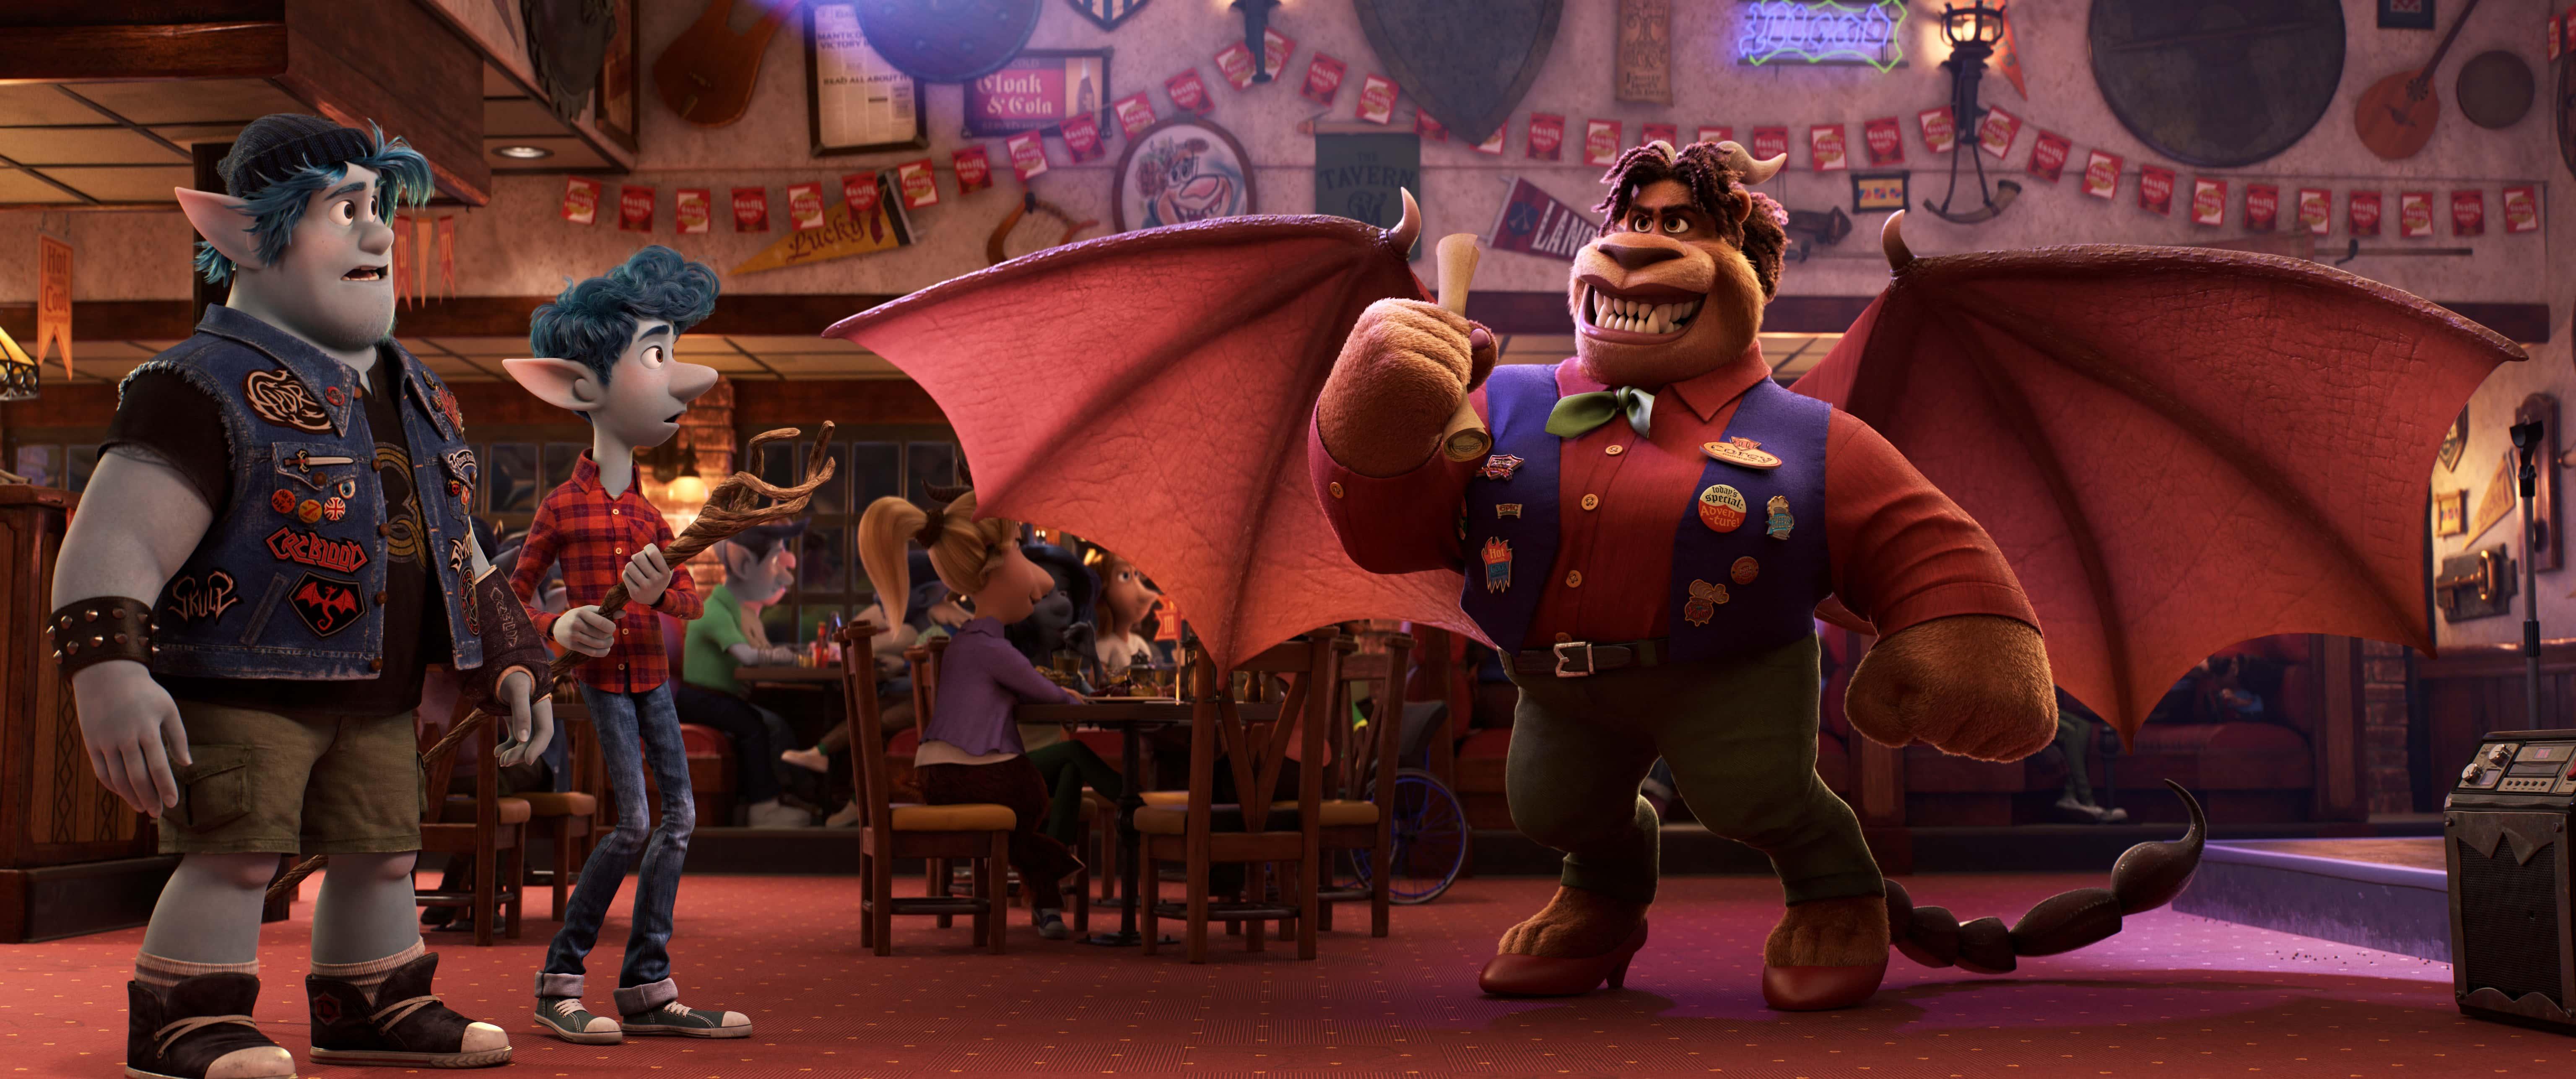 New Pixar Onward Trailer